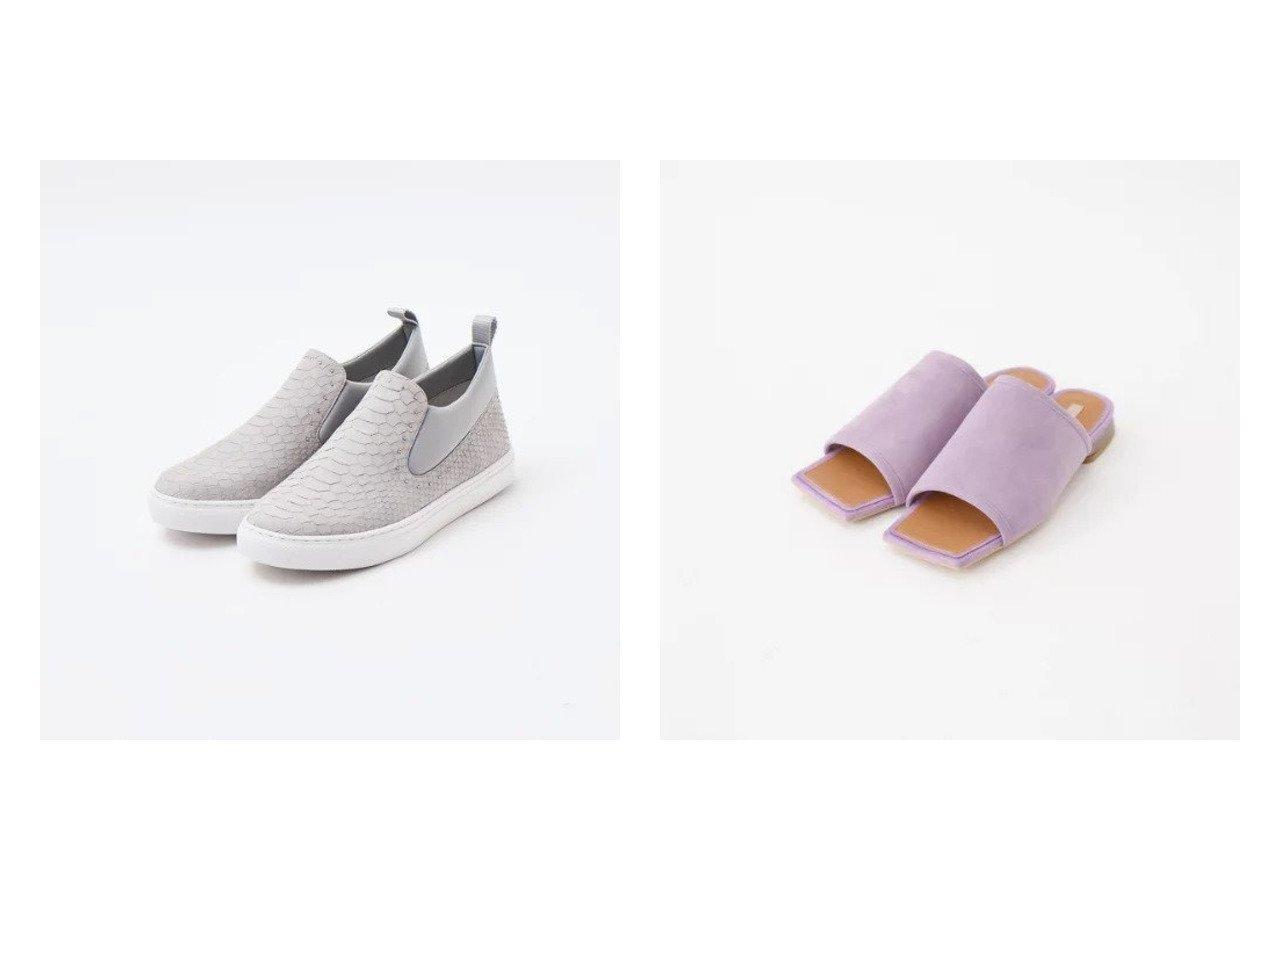 【Au BANNISTER/オゥ バニスター】のミドルカットスリッポンスニーカー&スクエアトゥ フラットミュール 【シューズ・靴】おすすめ!人気、トレンド・レディースファッションの通販 おすすめで人気の流行・トレンド、ファッションの通販商品 メンズファッション・キッズファッション・インテリア・家具・レディースファッション・服の通販 founy(ファニー) https://founy.com/ ファッション Fashion レディースファッション WOMEN サンダル シューズ ミュール S/S・春夏 SS・Spring/Summer スリッポン パイソン フラット ミドル 春 Spring  ID:crp329100000030401